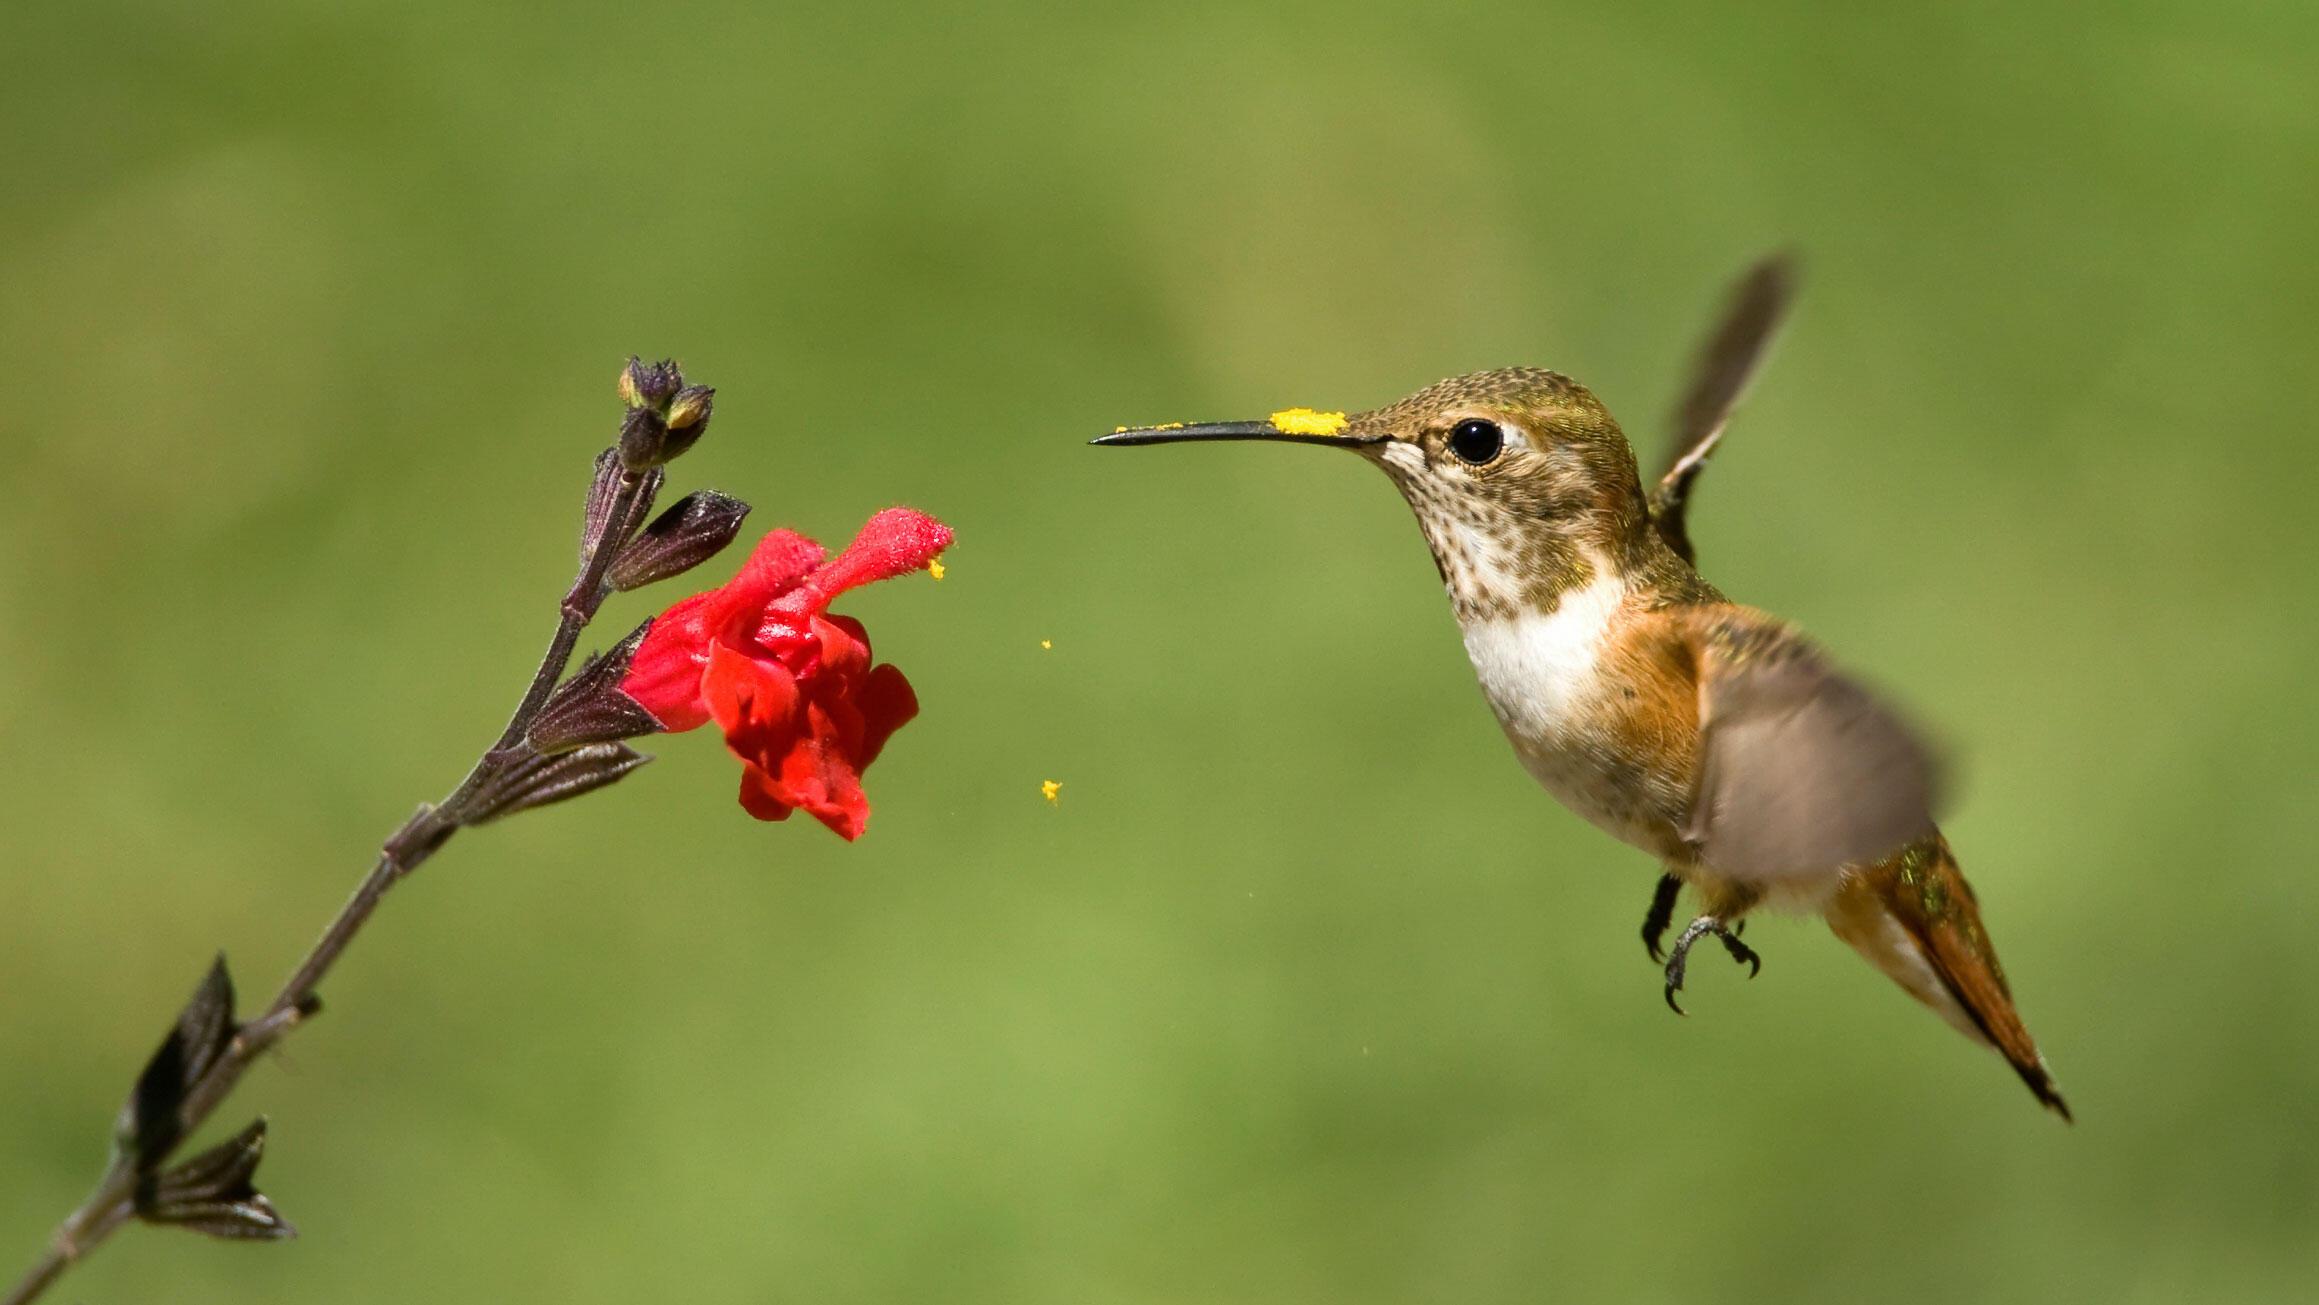 Rufous Hummingbird. Stan Tekiela/NatureSmart.com